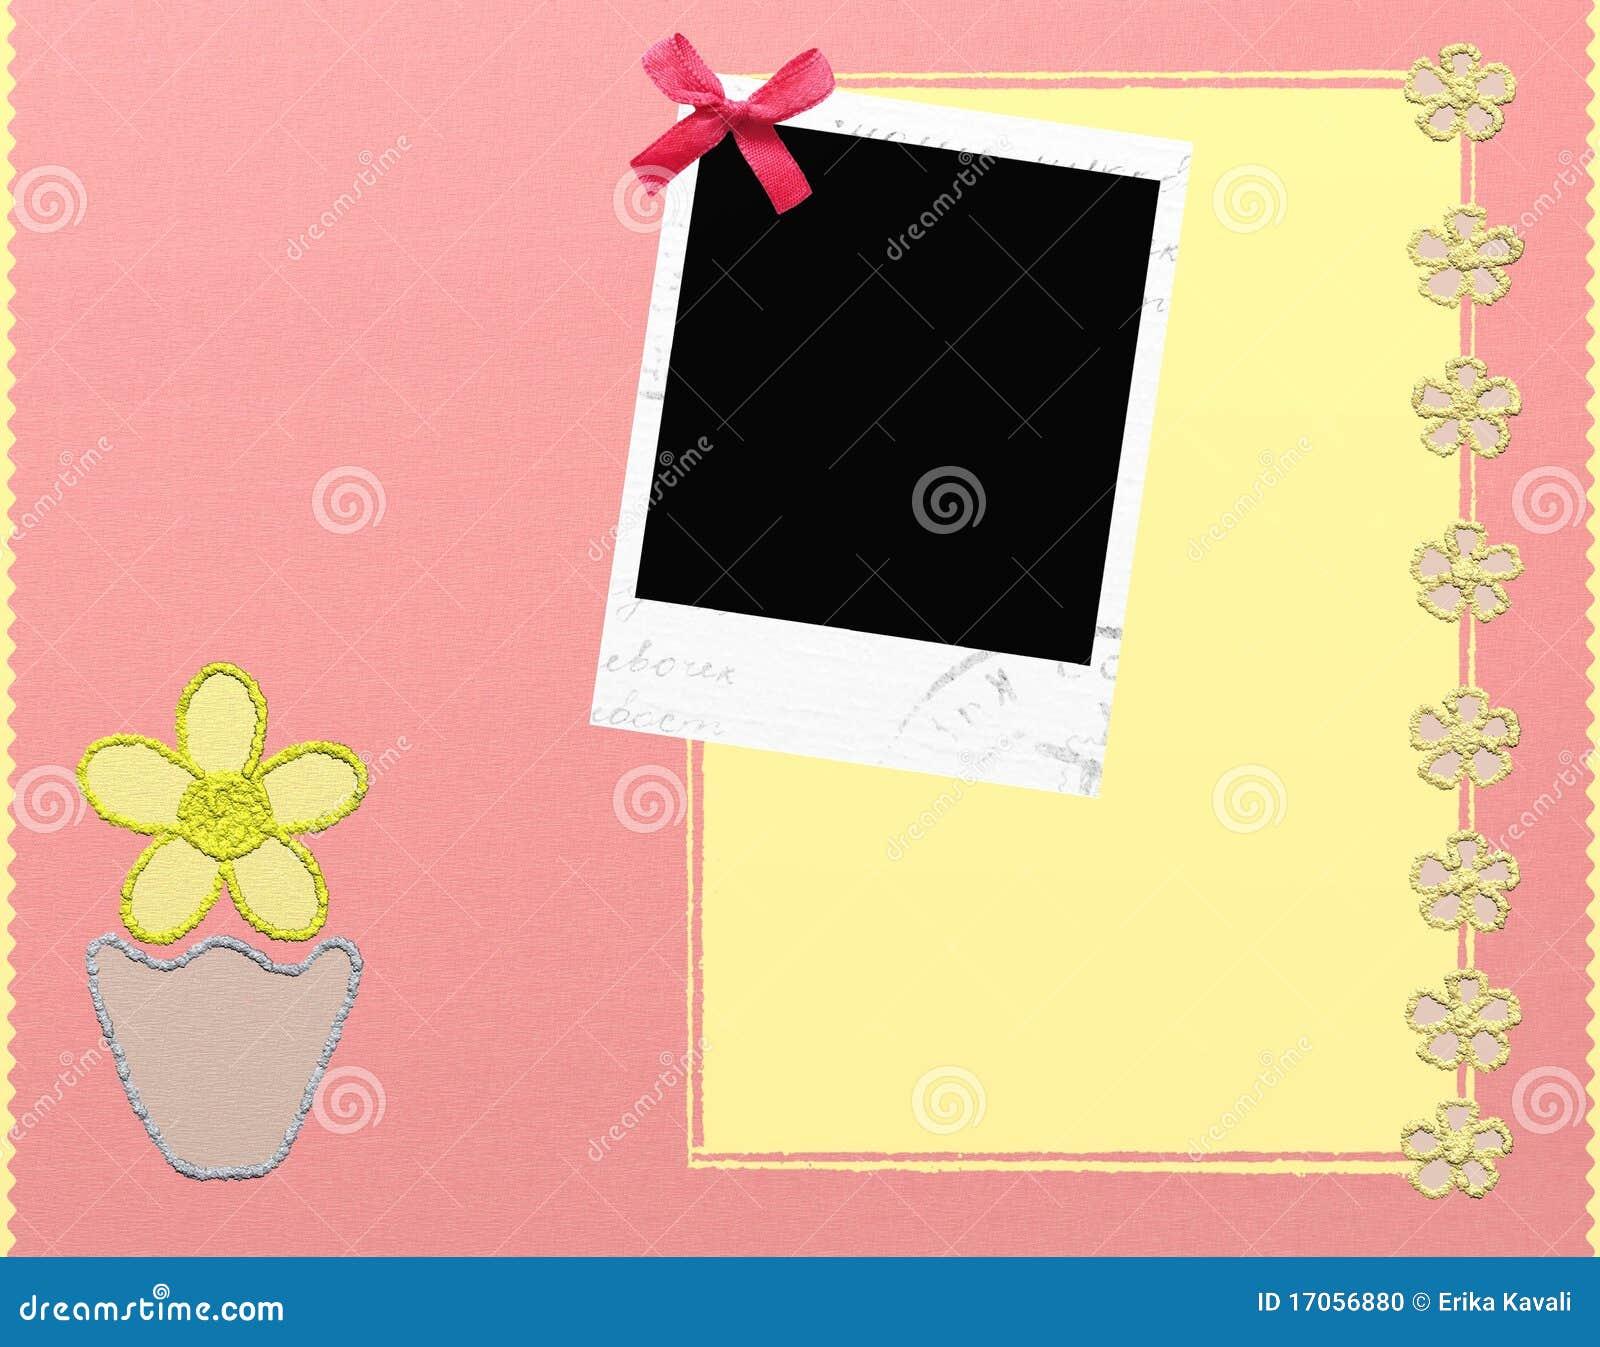 Cute photo frames stock illustration. Illustration of frames - 17056880